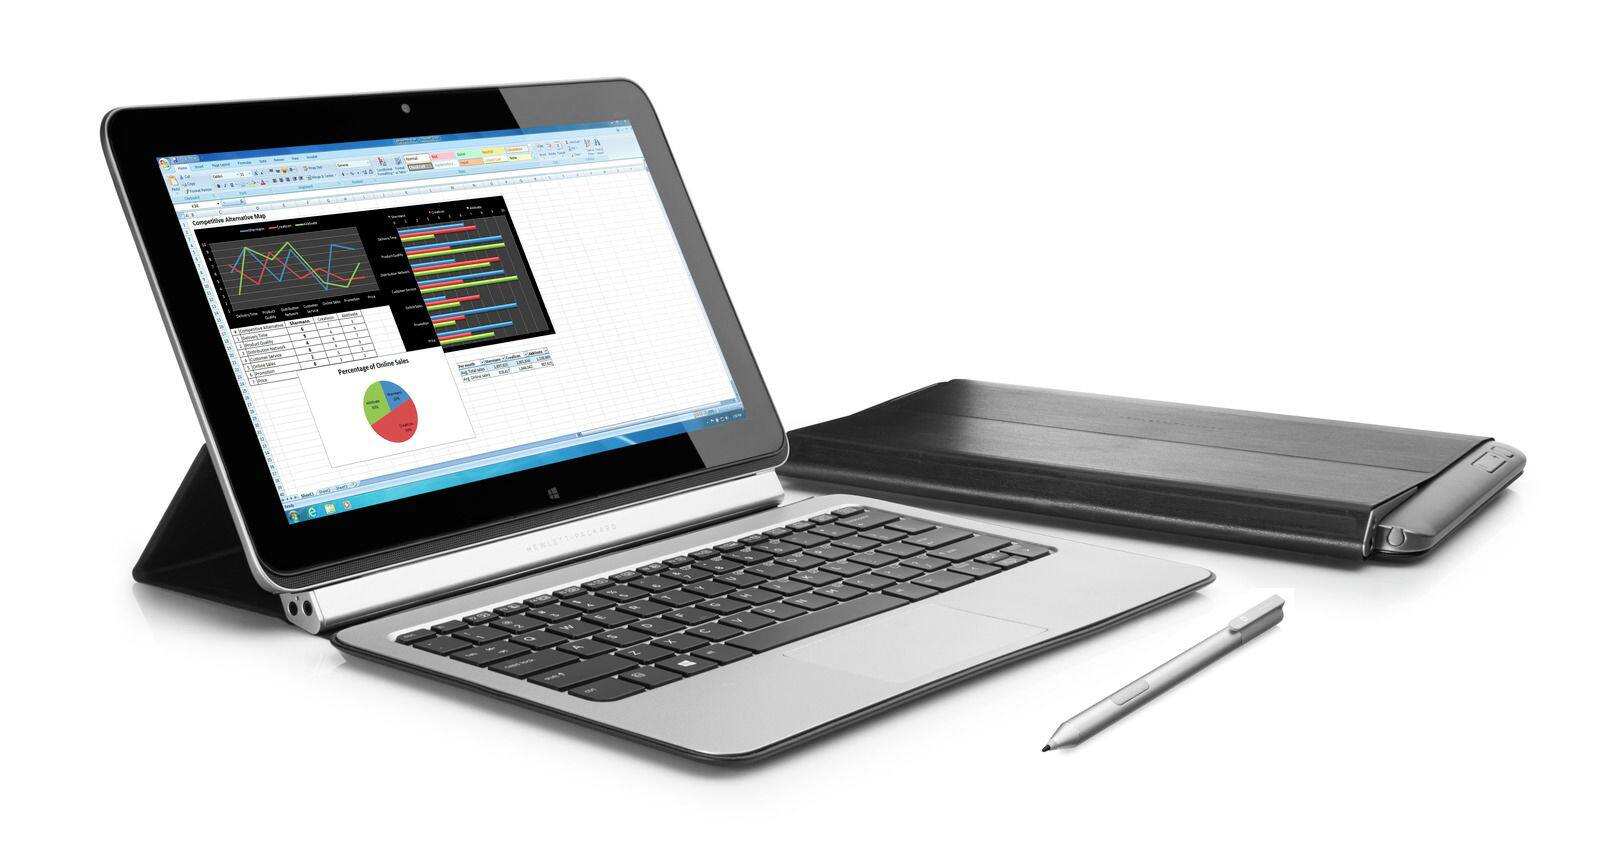 "HP Elite X2 G1 11.6"" 1080P IPS Touch, Core M-5Y51, 8GB Ram, 128GB SSD, Travel Keyboard Dock, Win8.1 Pro @ $419 + $15 Gift card, F/S"